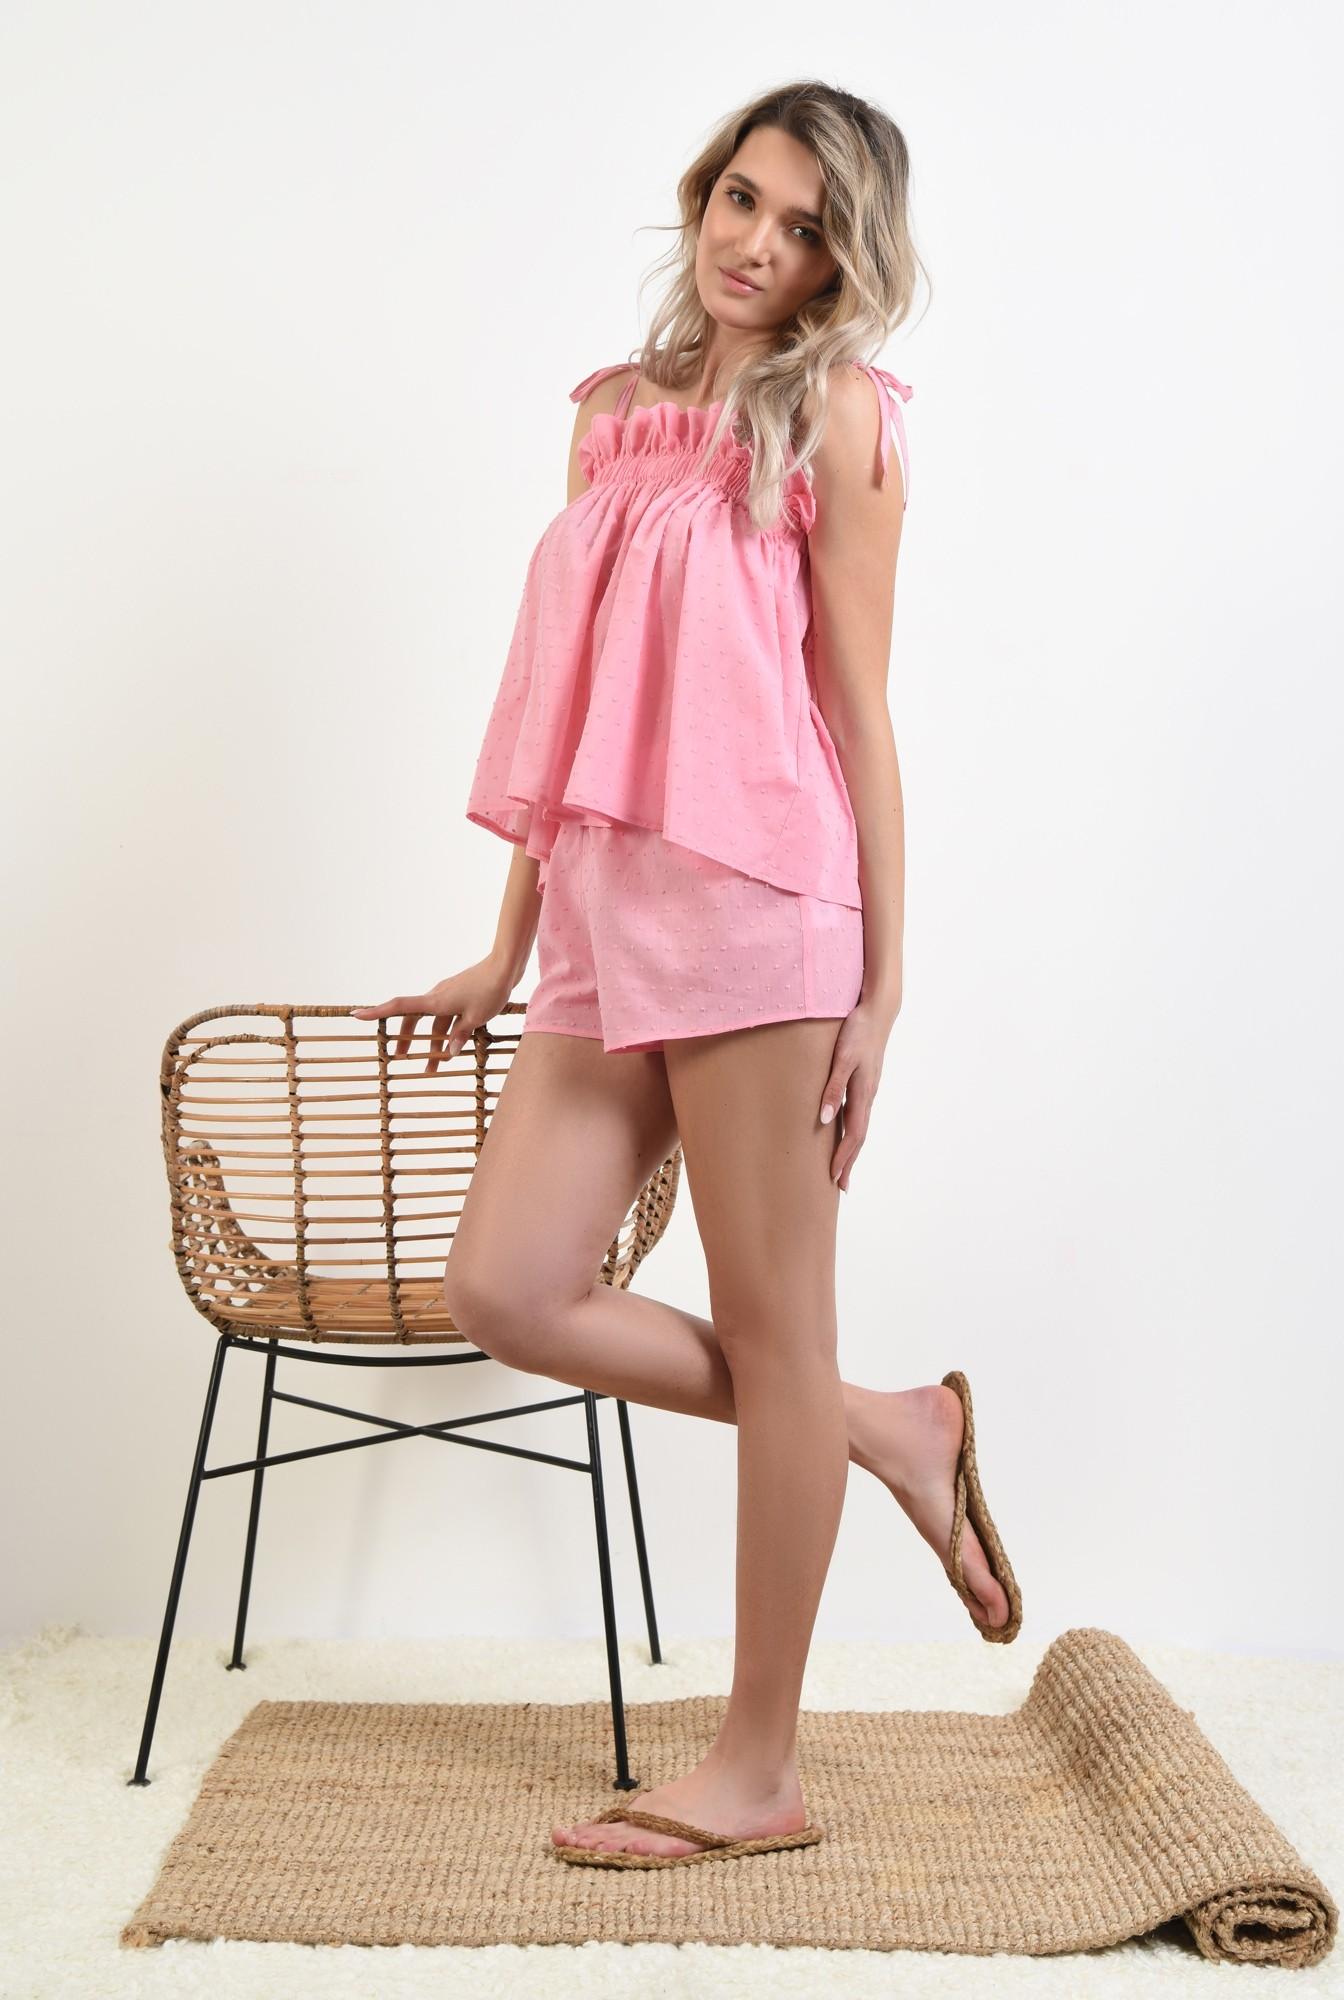 360 - pantaloni scurti, casual, plumeti, roz, sort plumeti